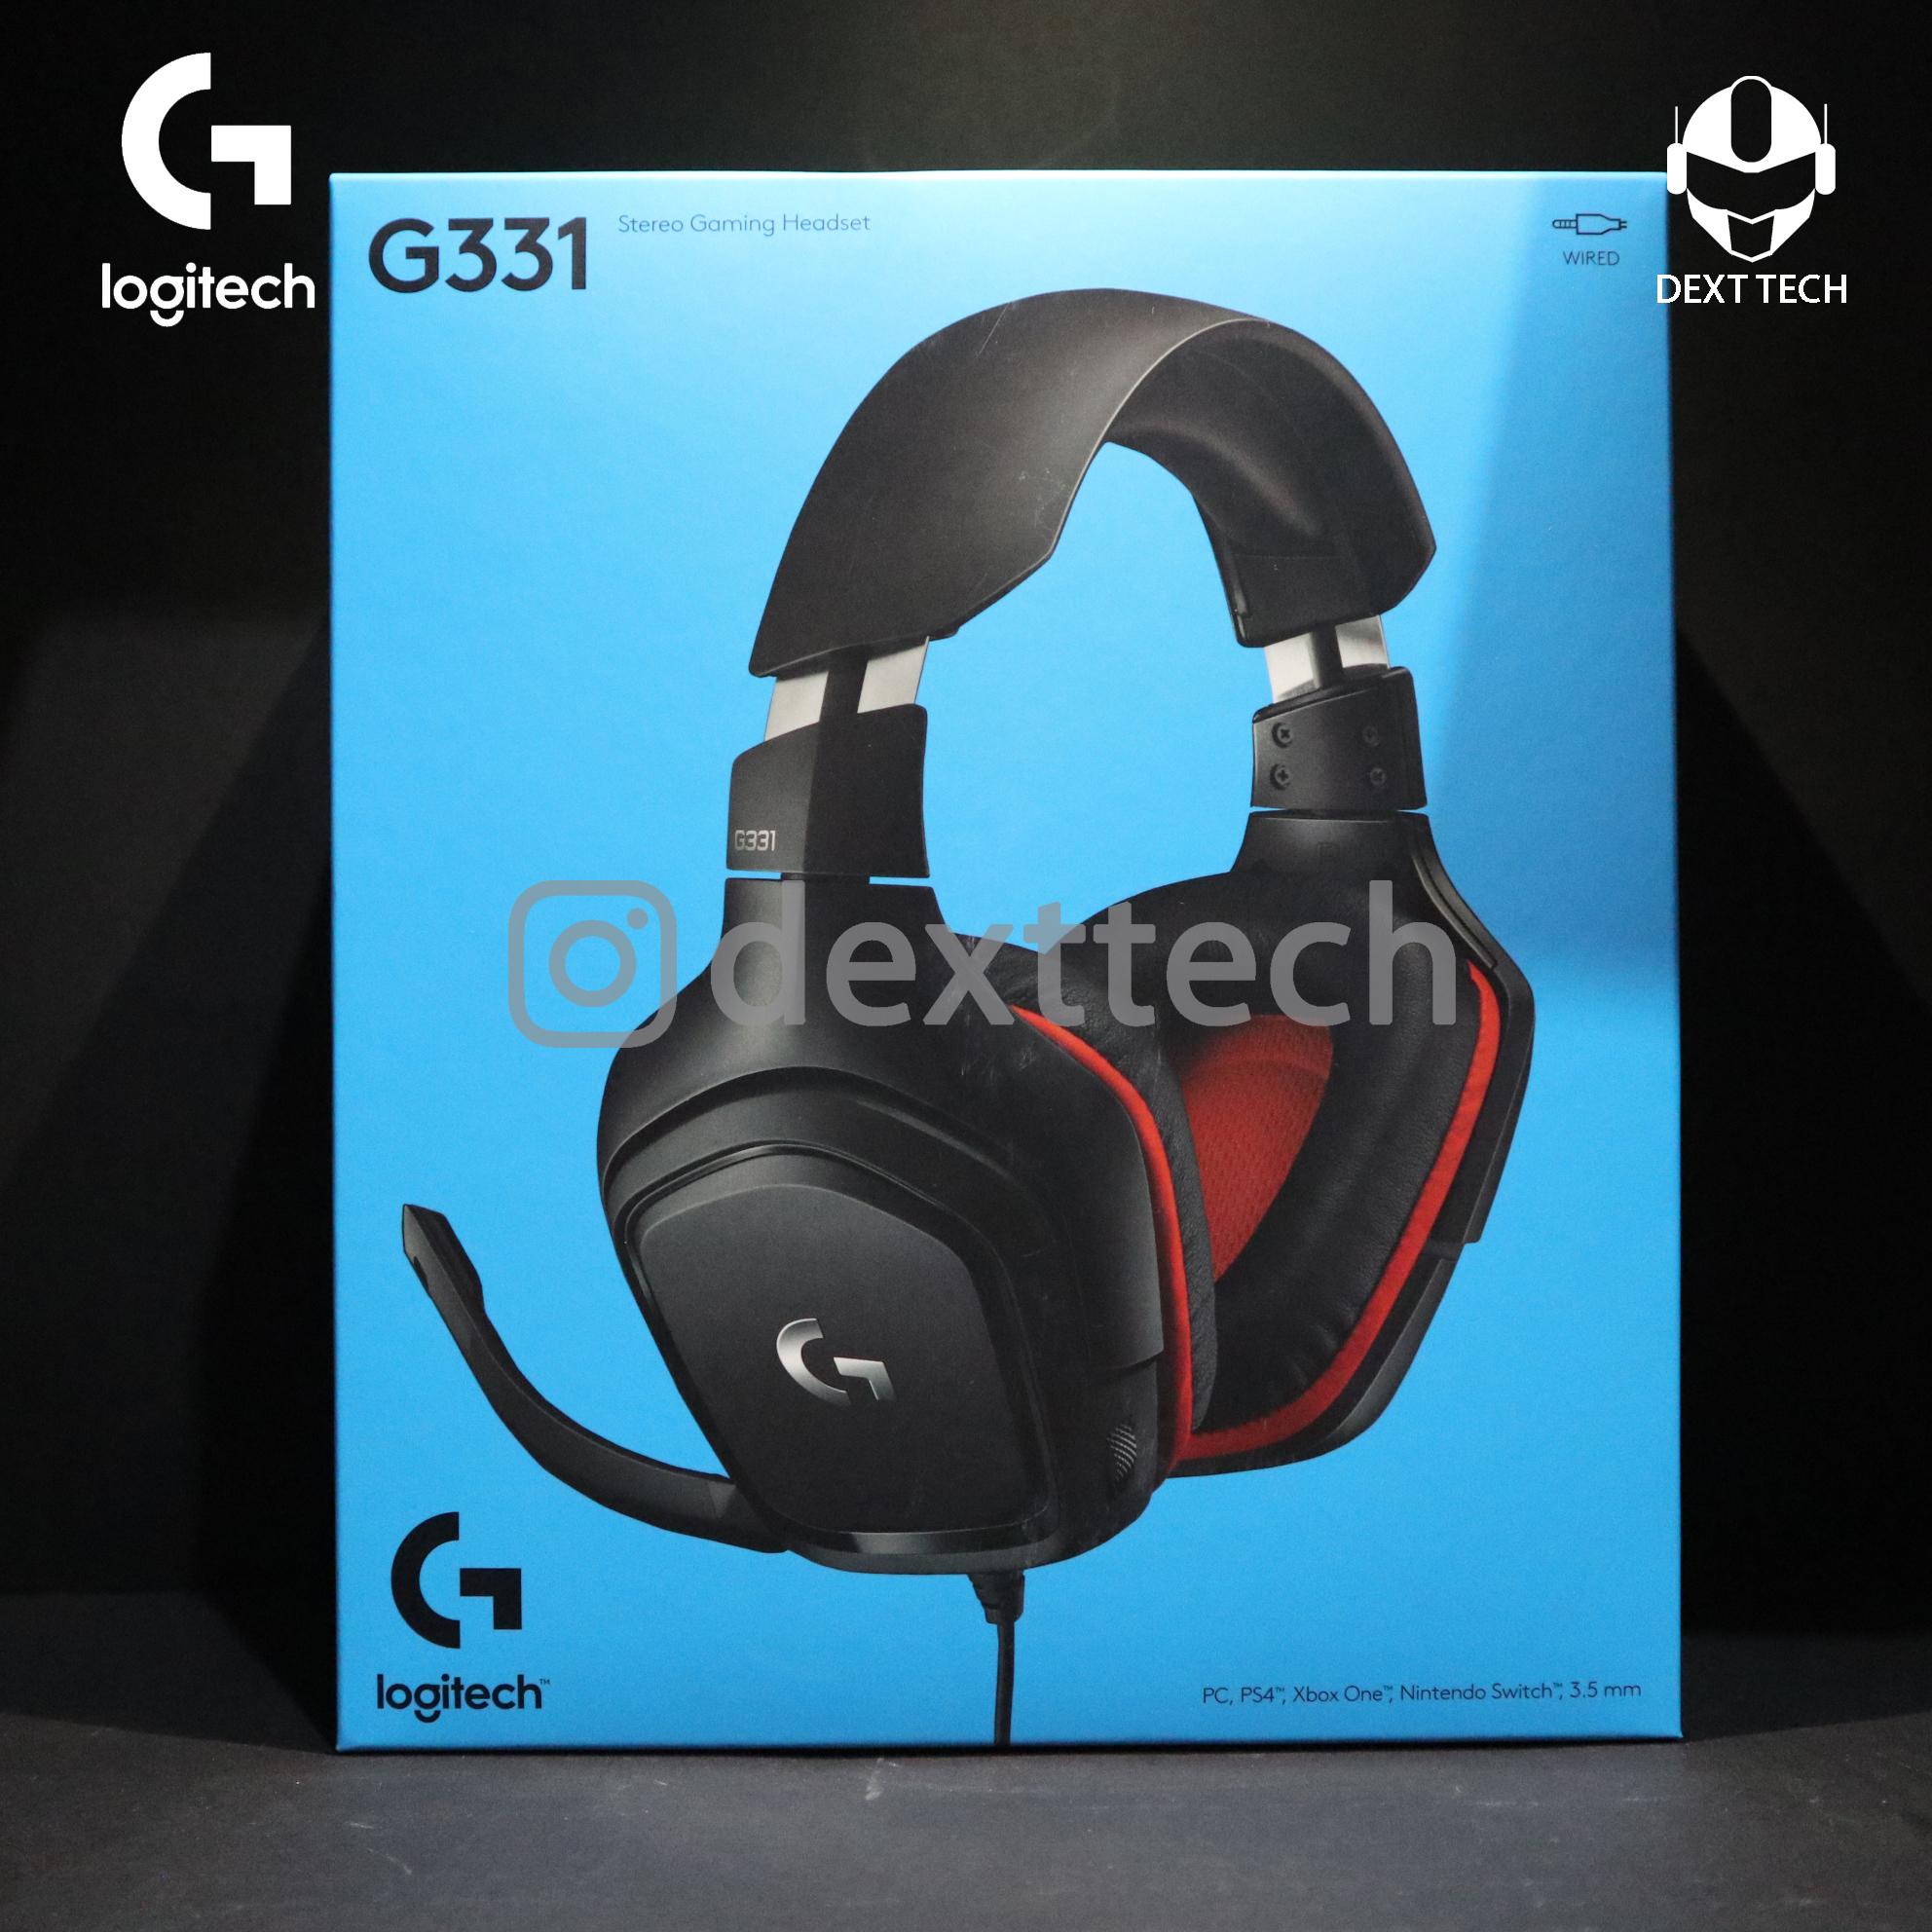 https://www.lazada.co.id/products/logitech-g231-prodigy-gaming-headset-i127327915-s134155088.html